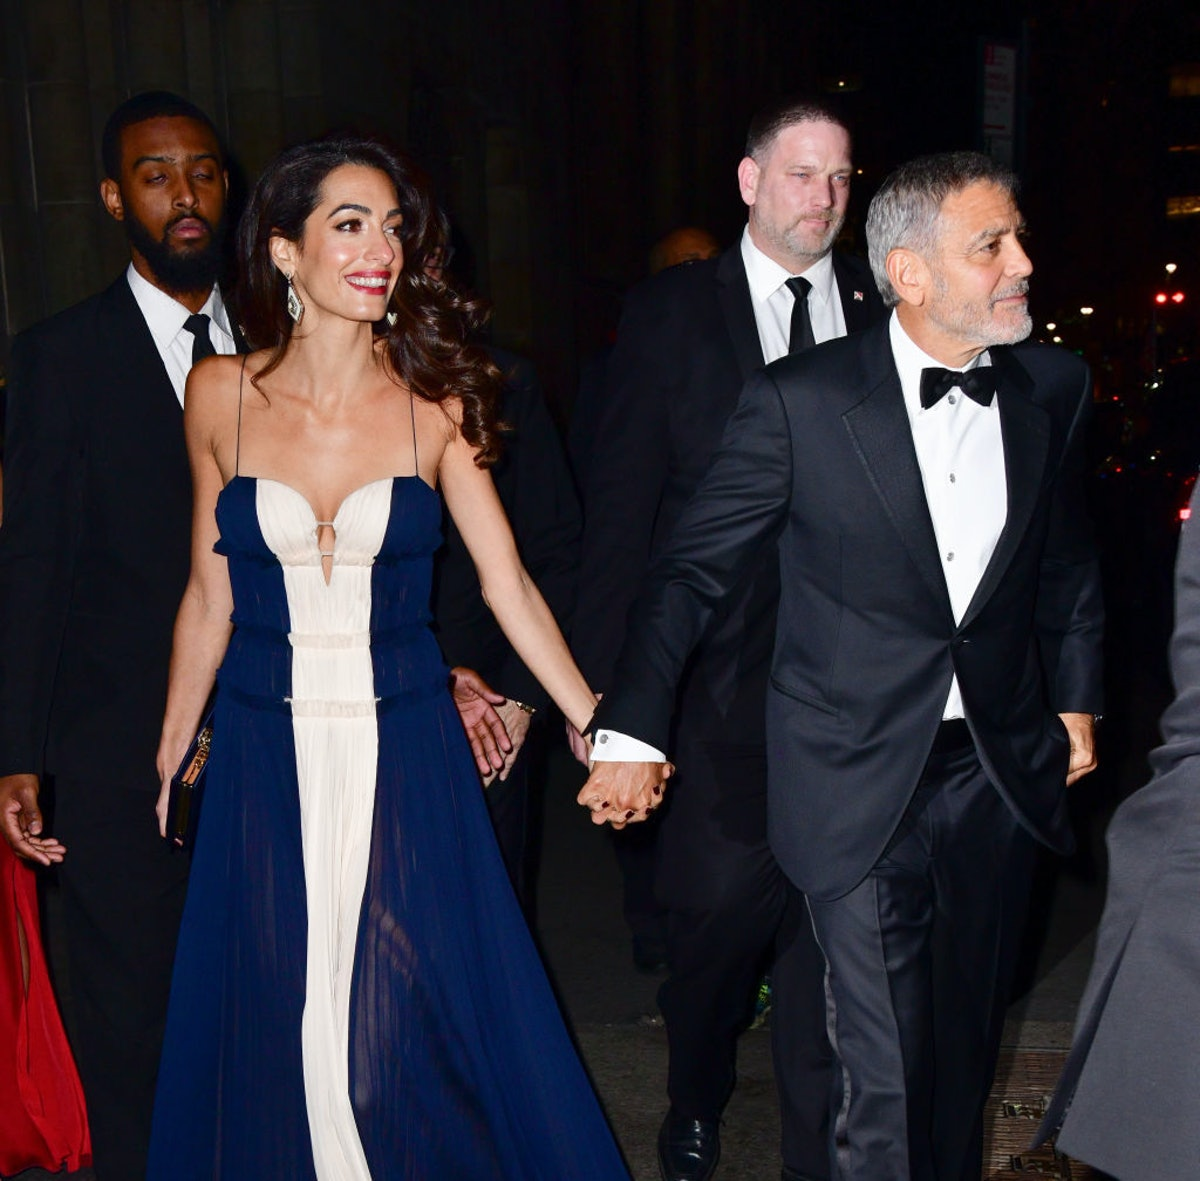 Celebrity Sightings in New York City - December 5, 2018